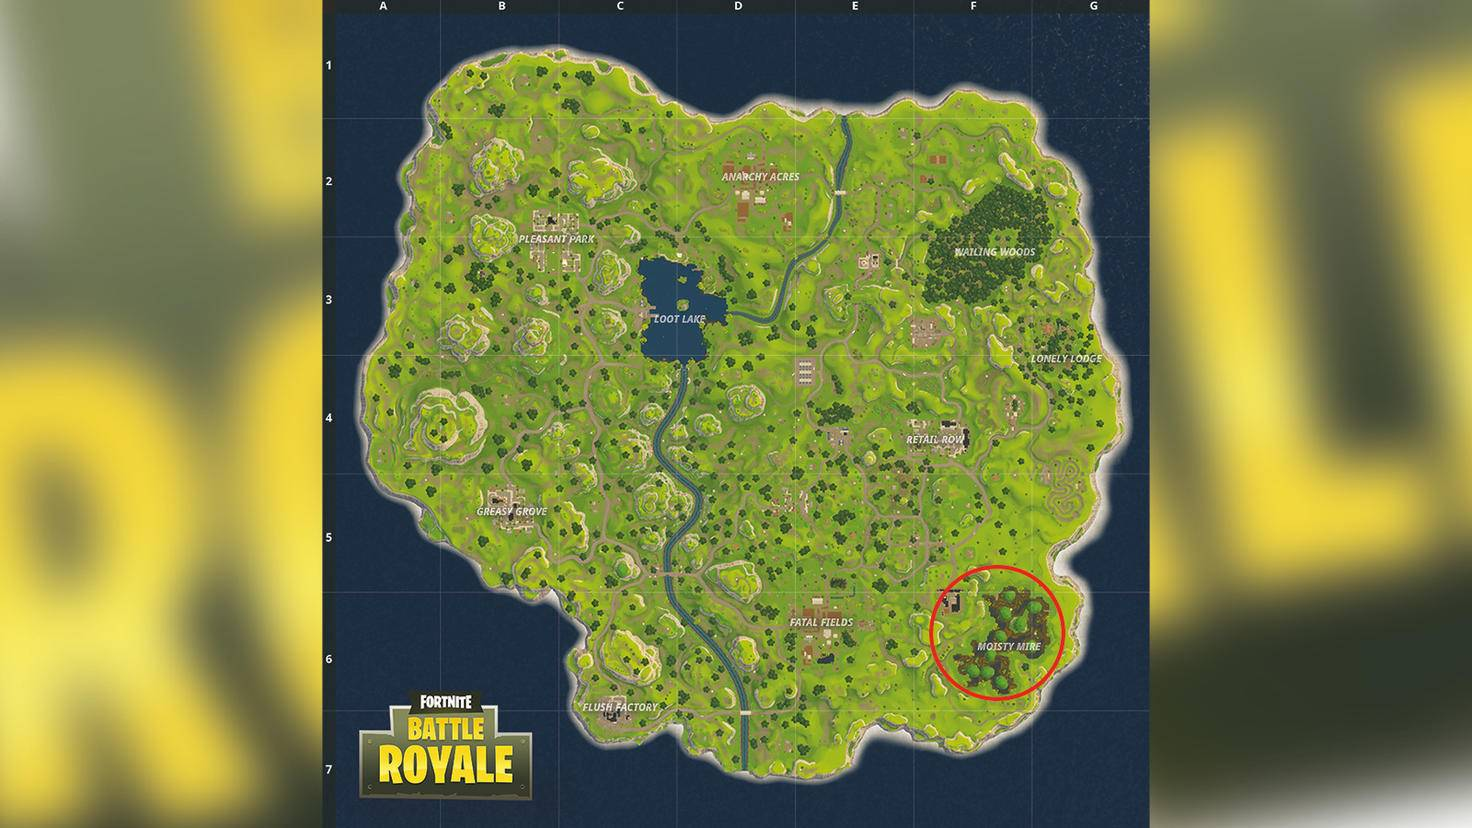 Fortnite: Battle Royale – der Landeplatz Moisty Mire.